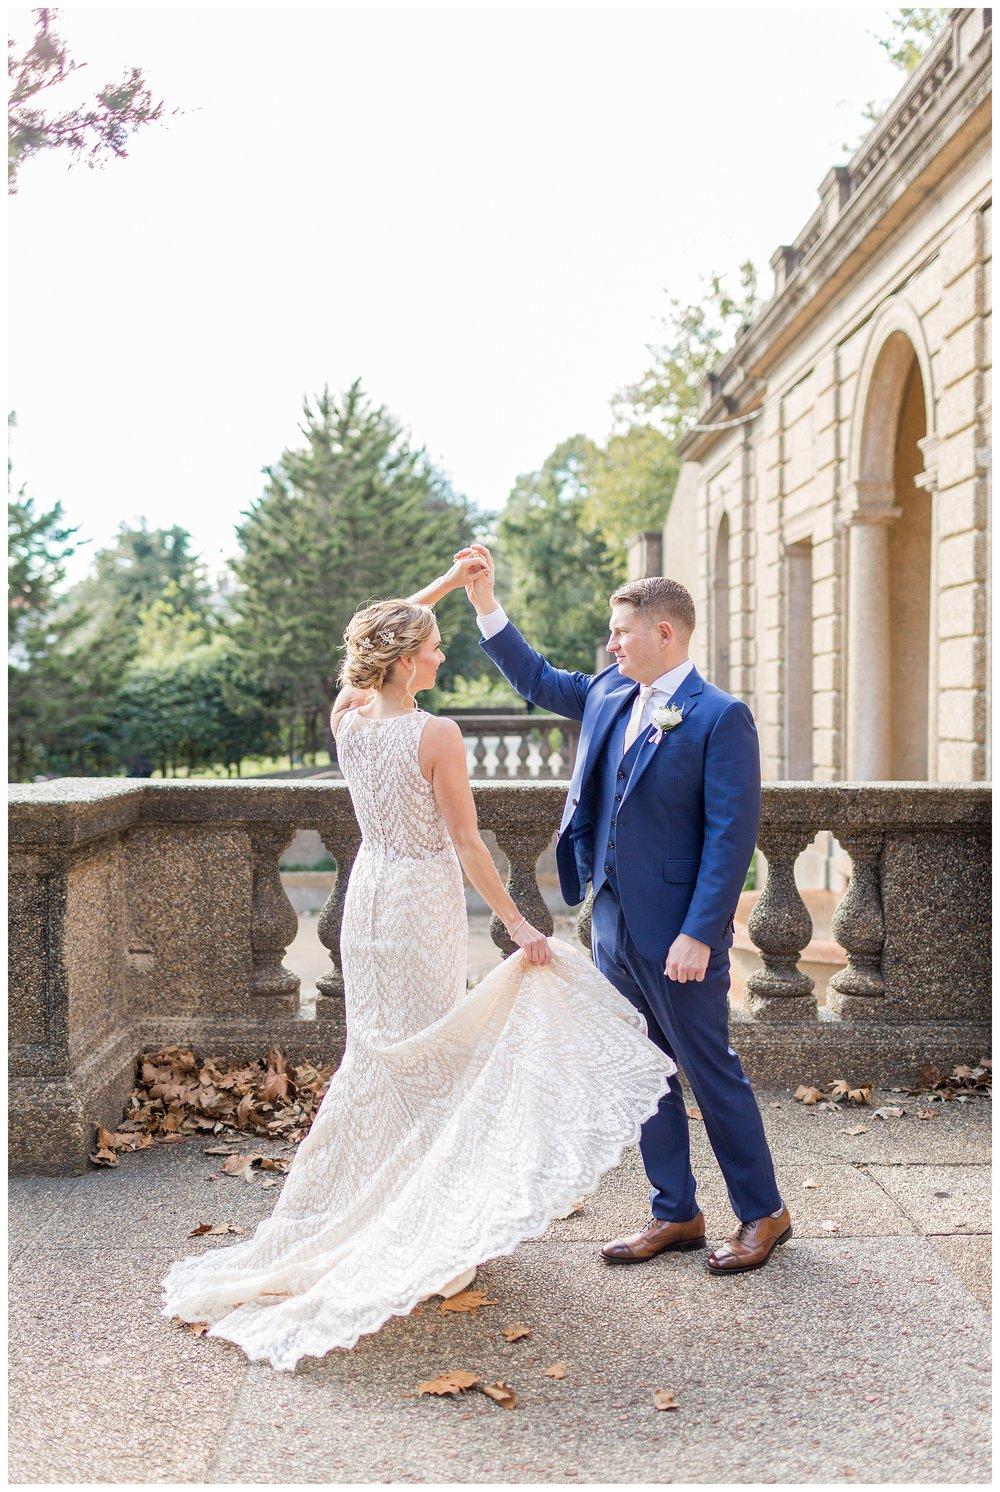 Meridian Hill Park Wedding | Washington DC Wedding Photographer Kir Tuben_0039.jpg